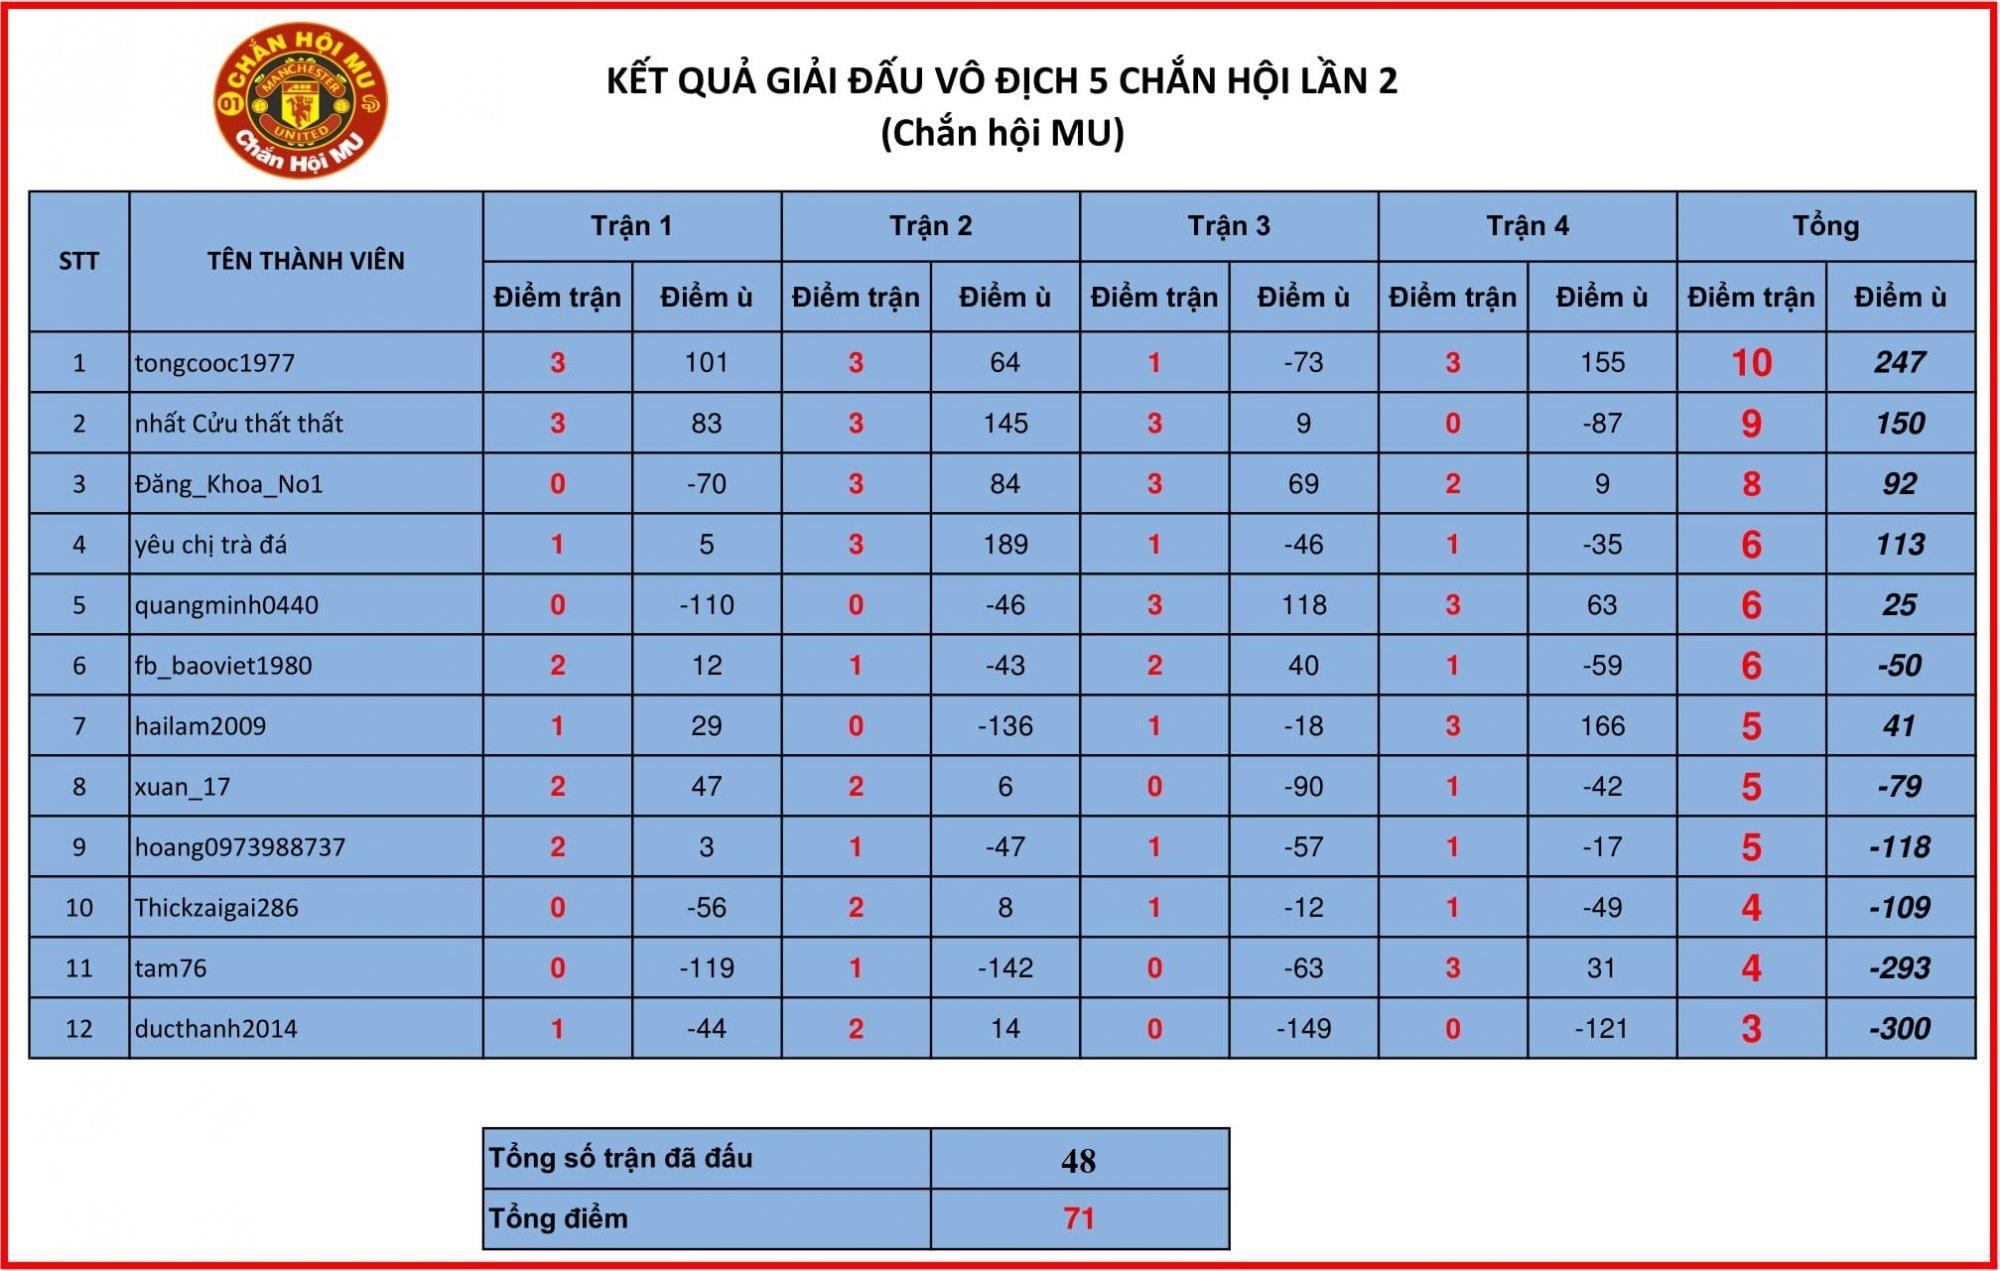 CHMU_final-1.